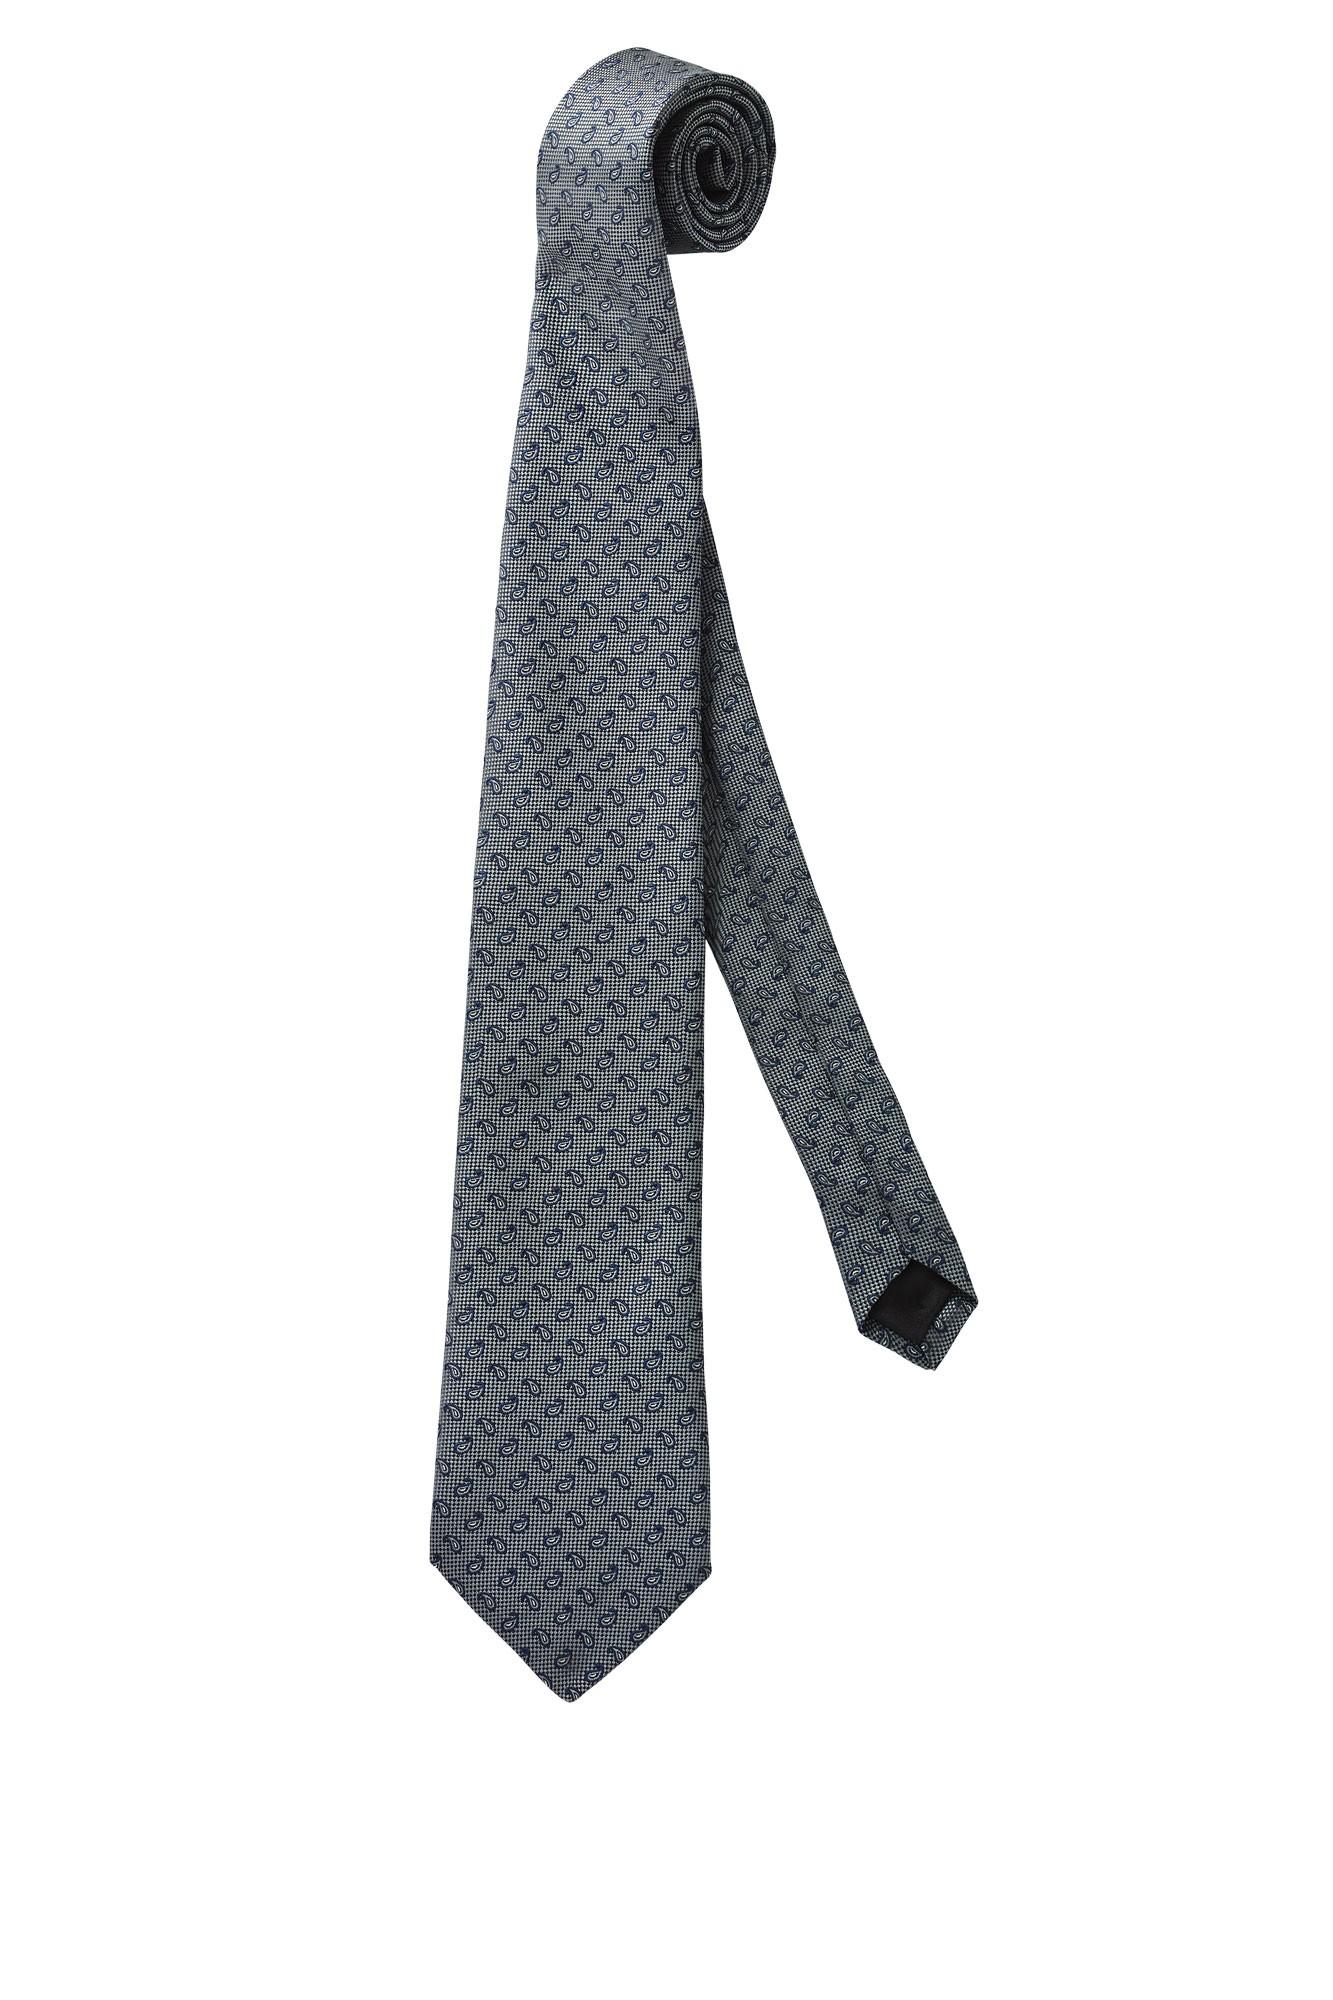 Kravata Paisley - šedá/modrá